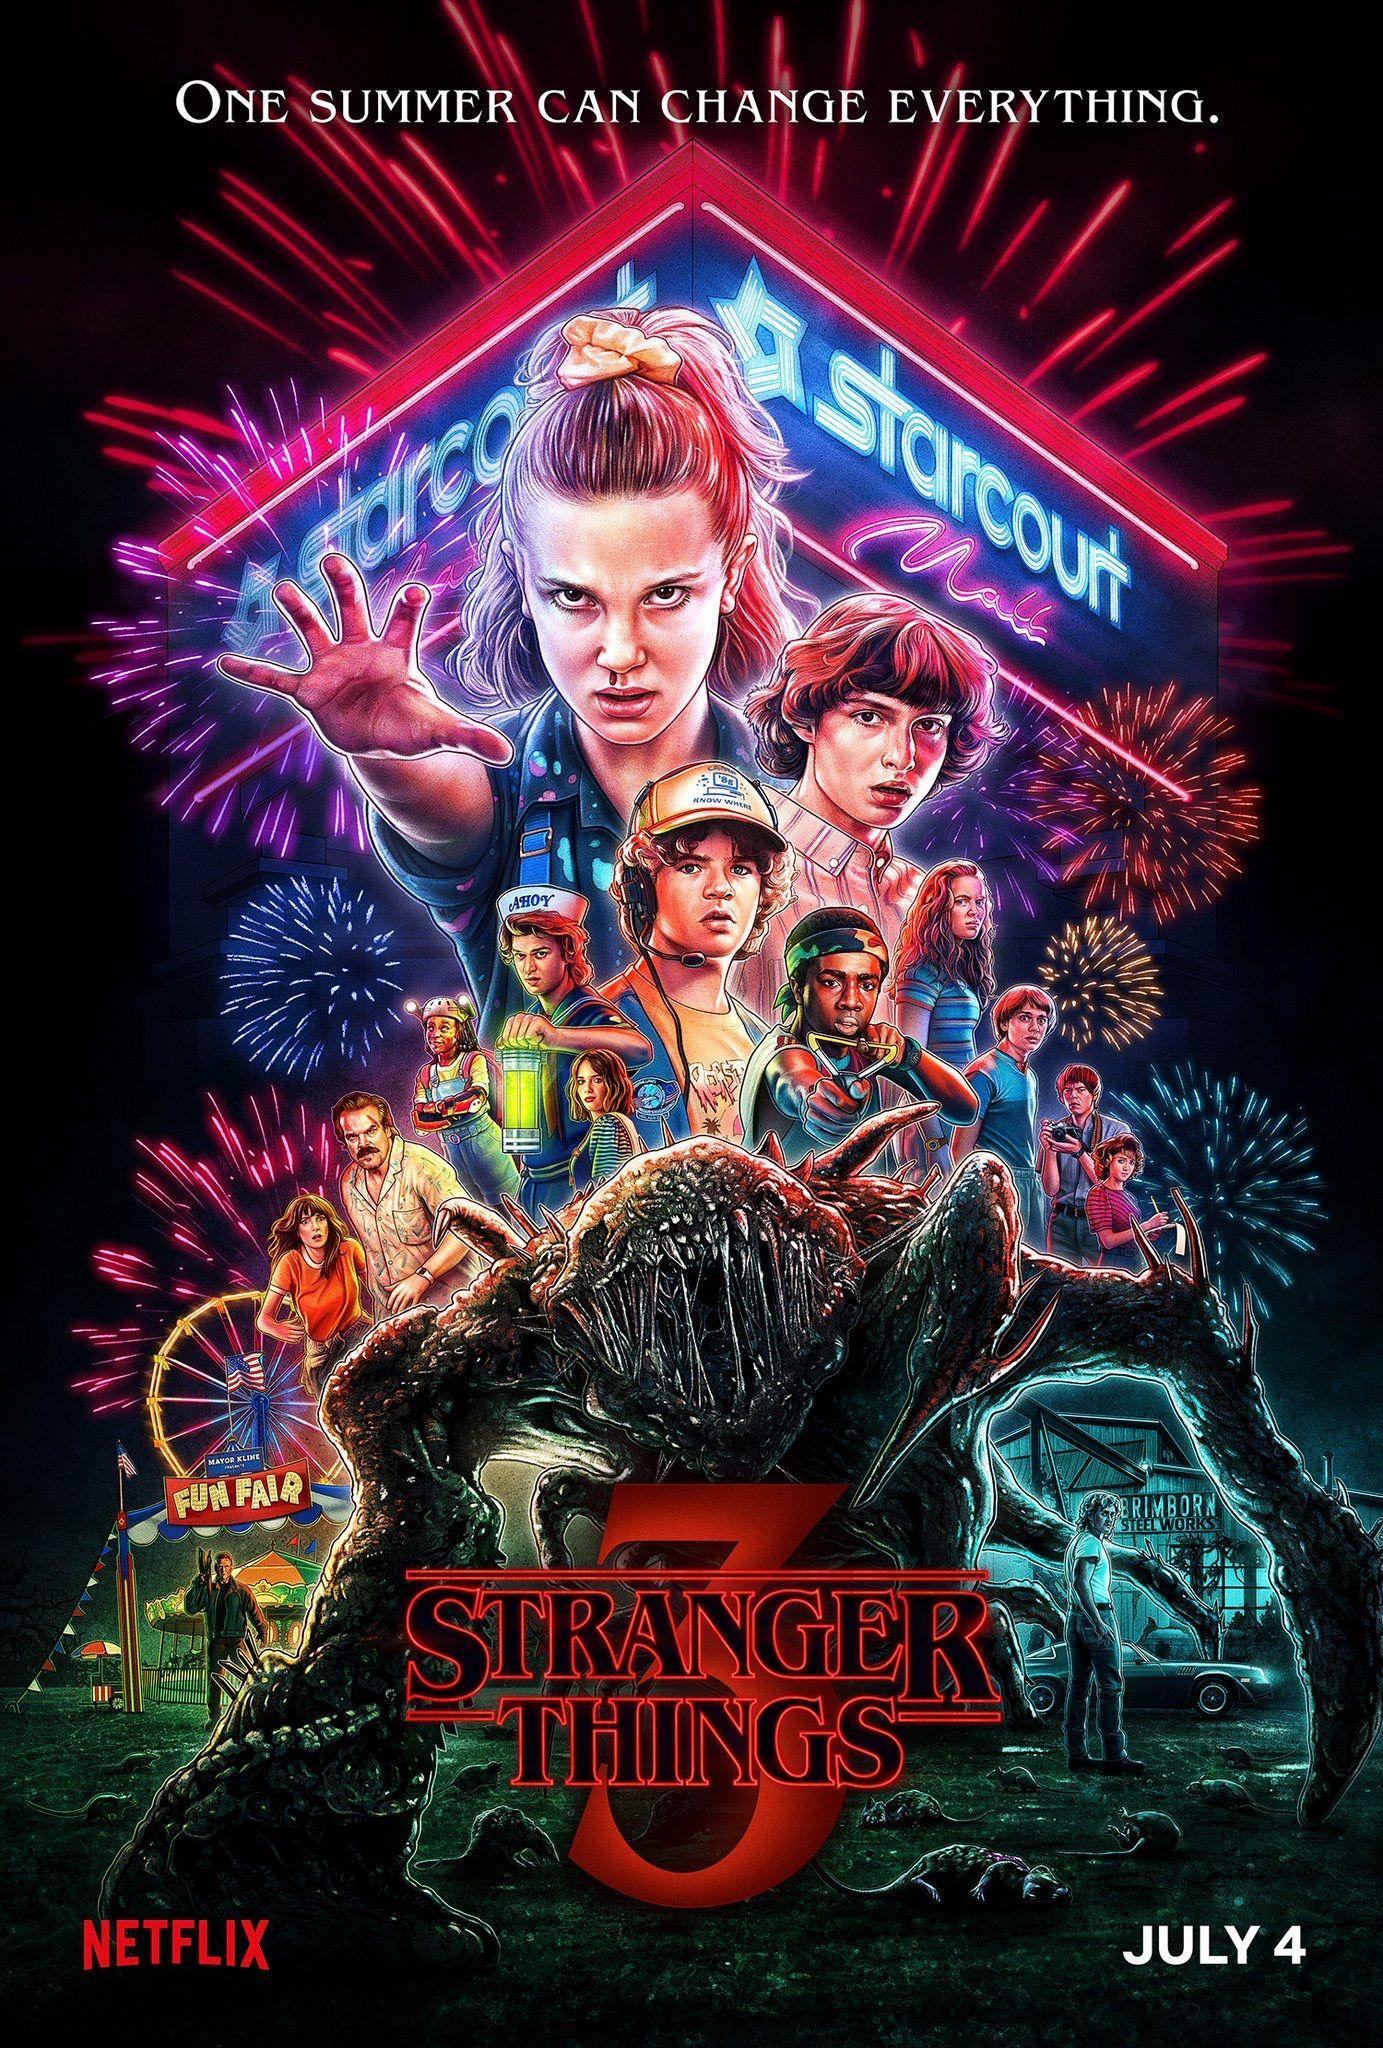 Stranger Things Saison 2 Résumé : stranger, things, saison, résumé, Stranger, Things, Season, Netflix, Poster,